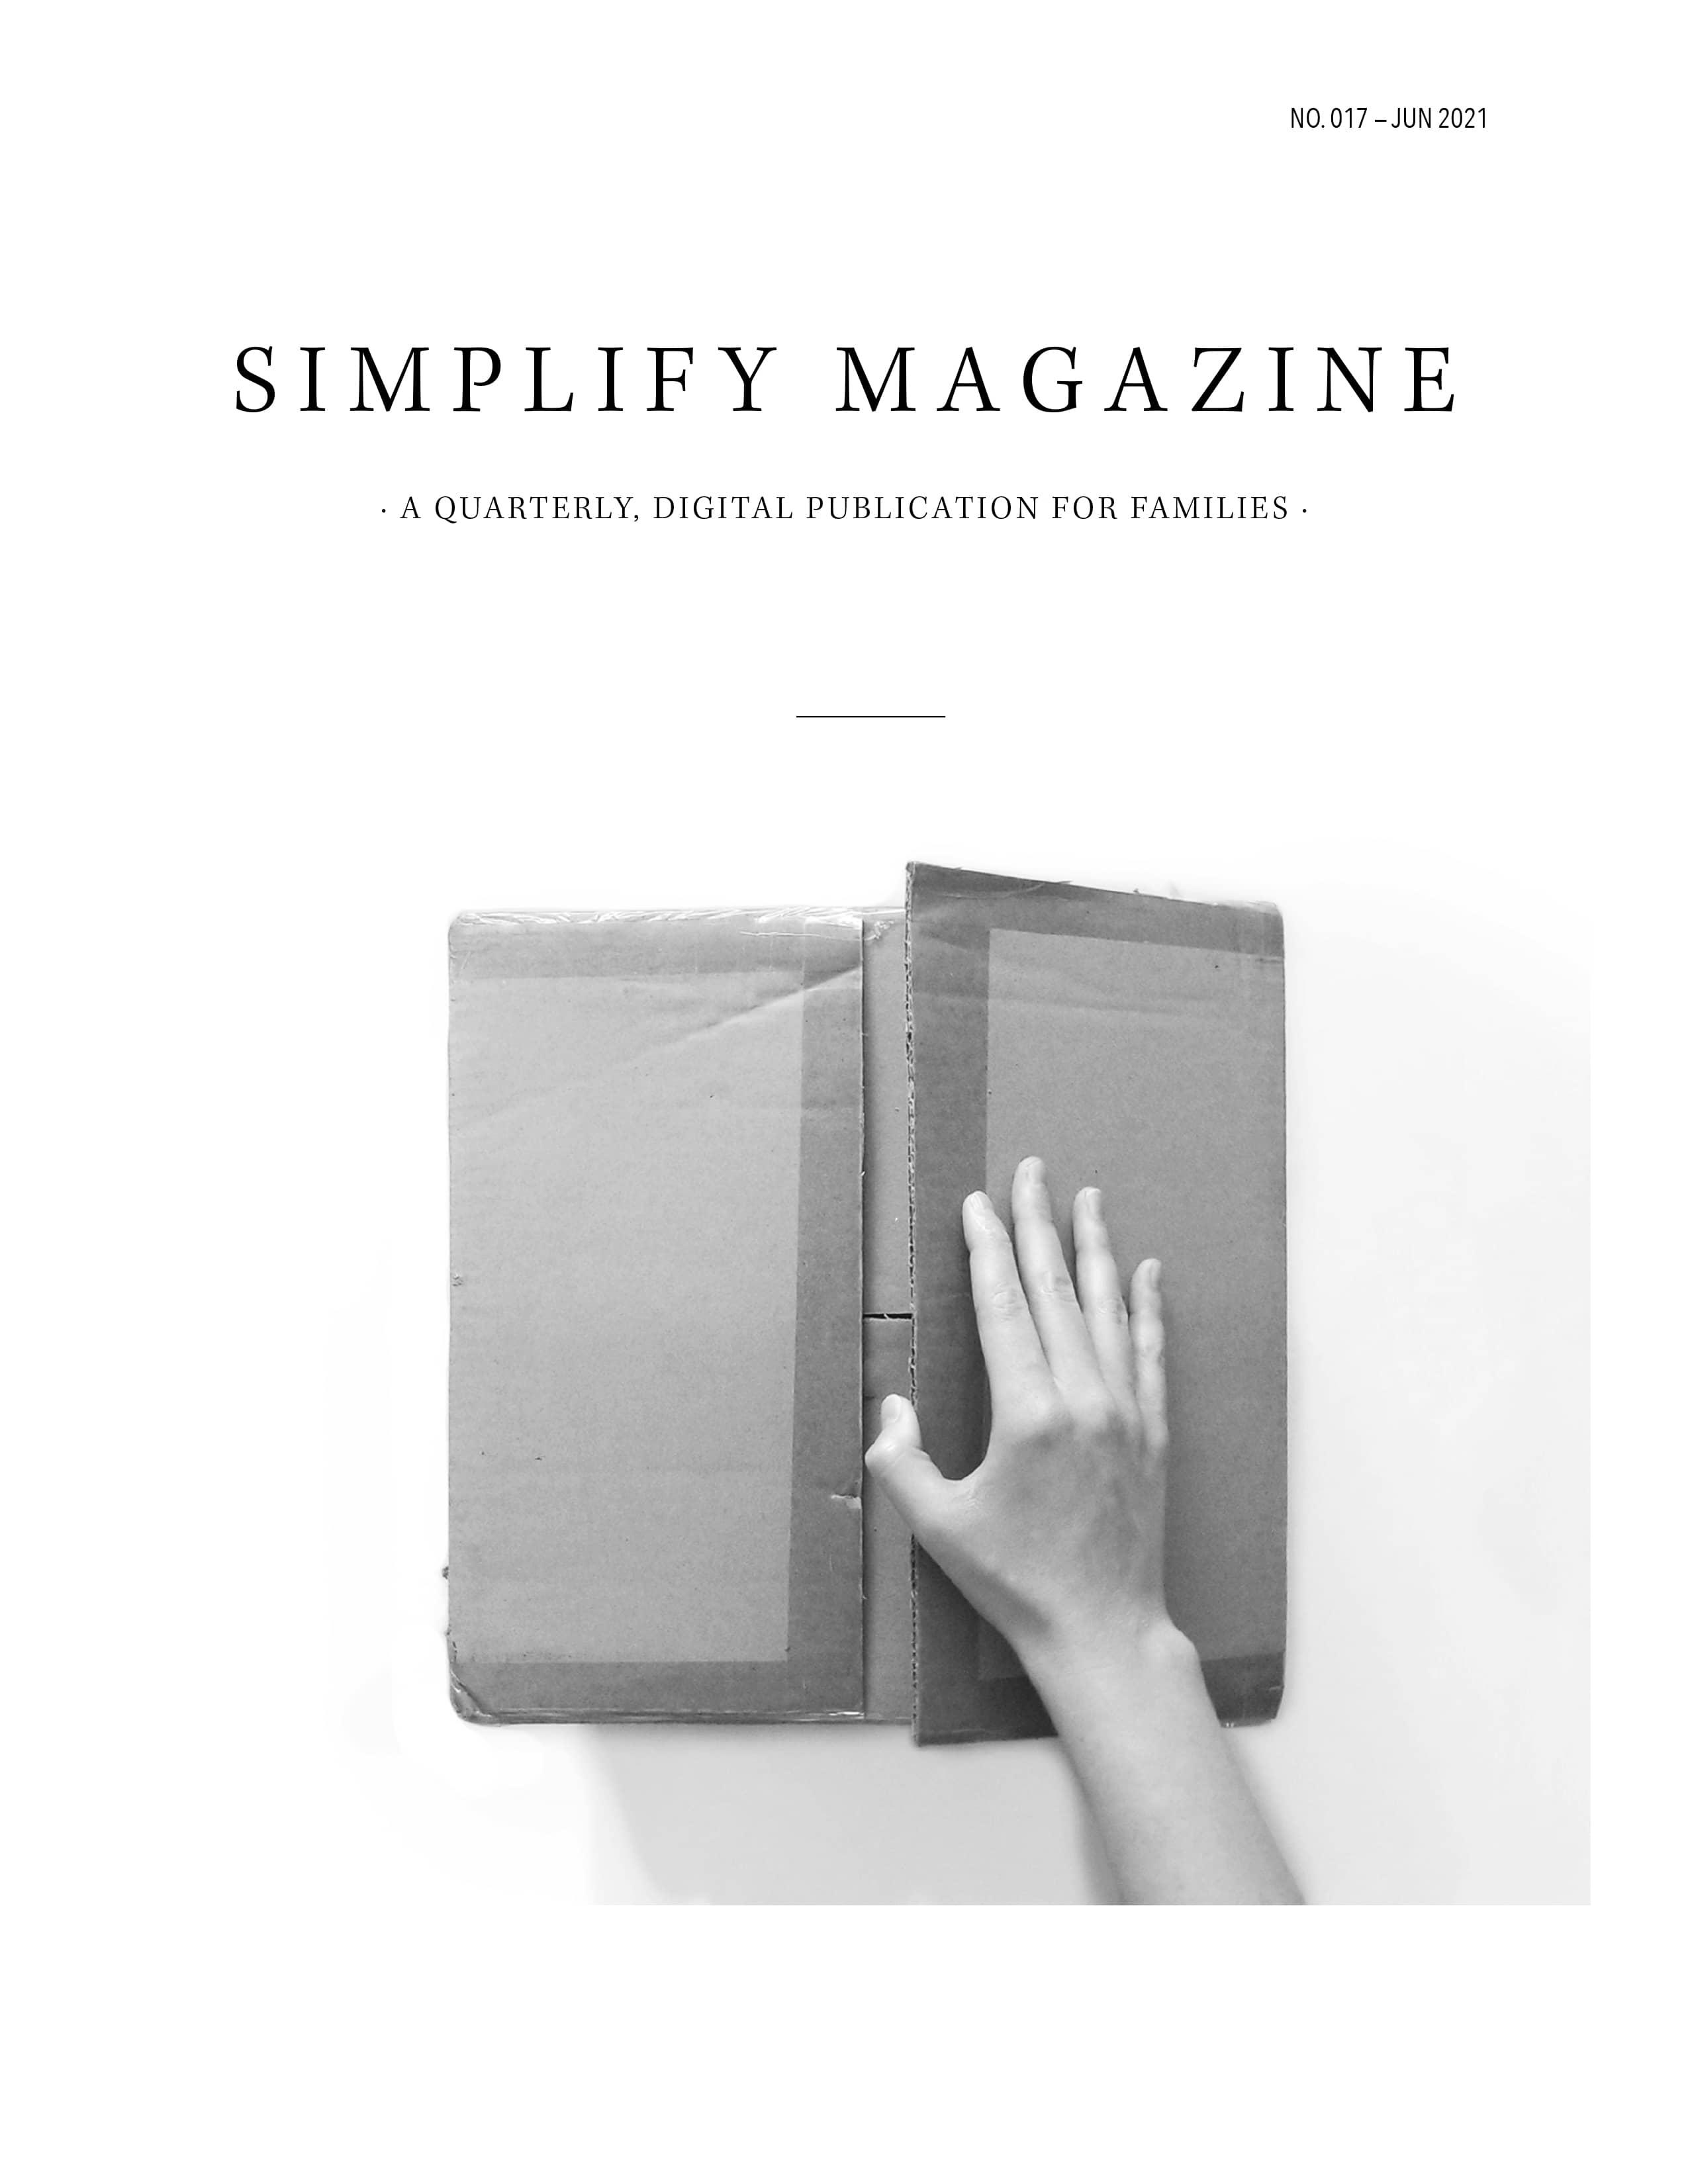 Simplify Magazine Issue #017